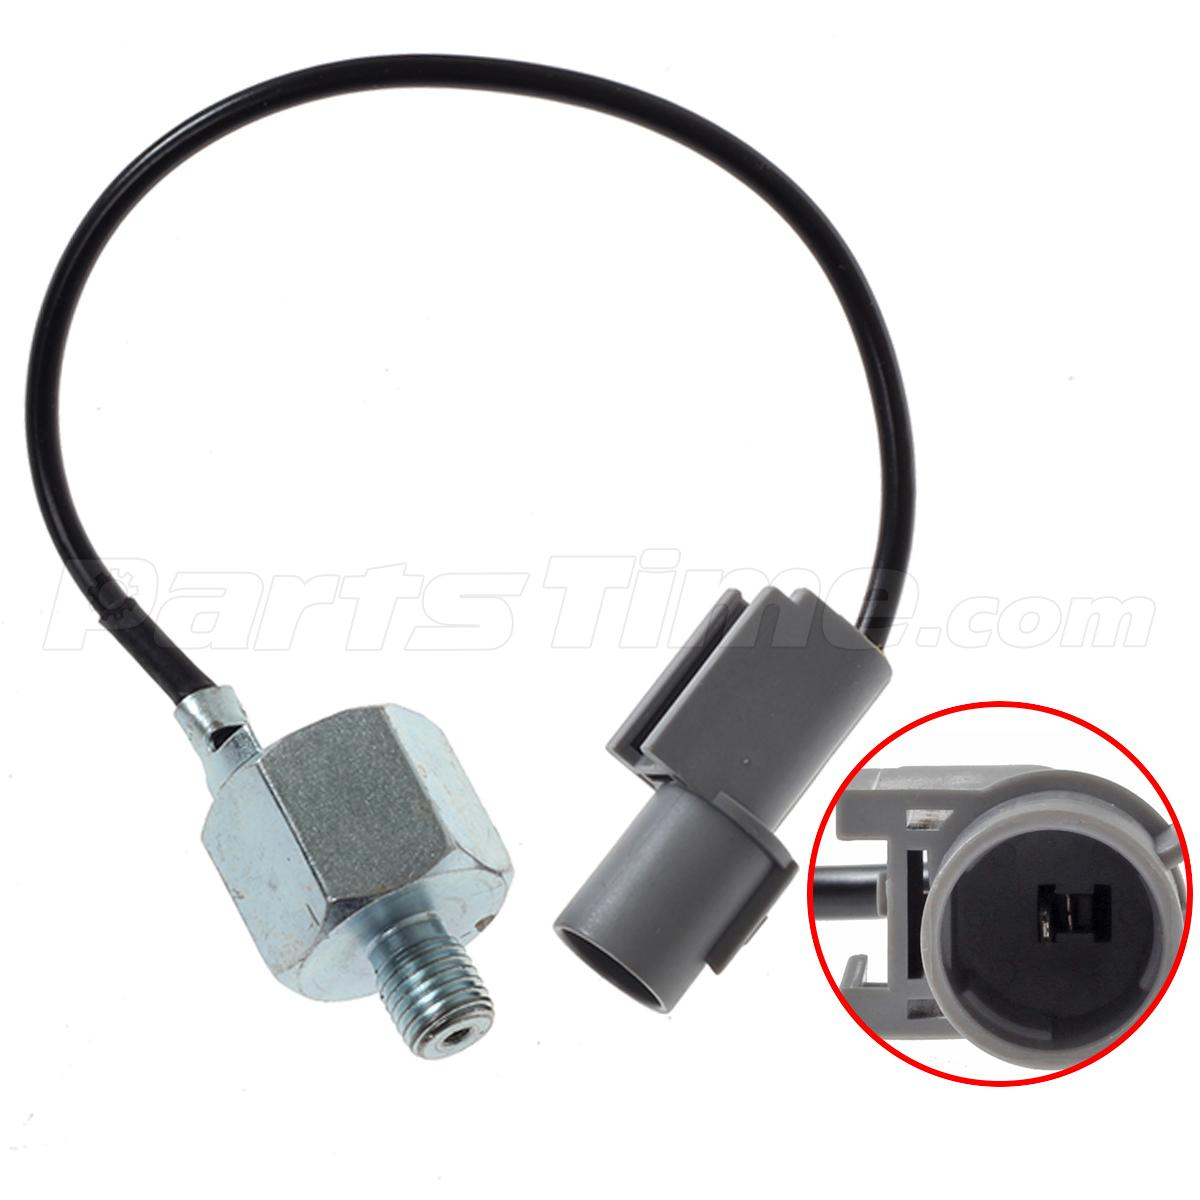 hight resolution of engine knock sensor 1864078g00 for suzuki grand vitara ford f 250 fog light wiring harness